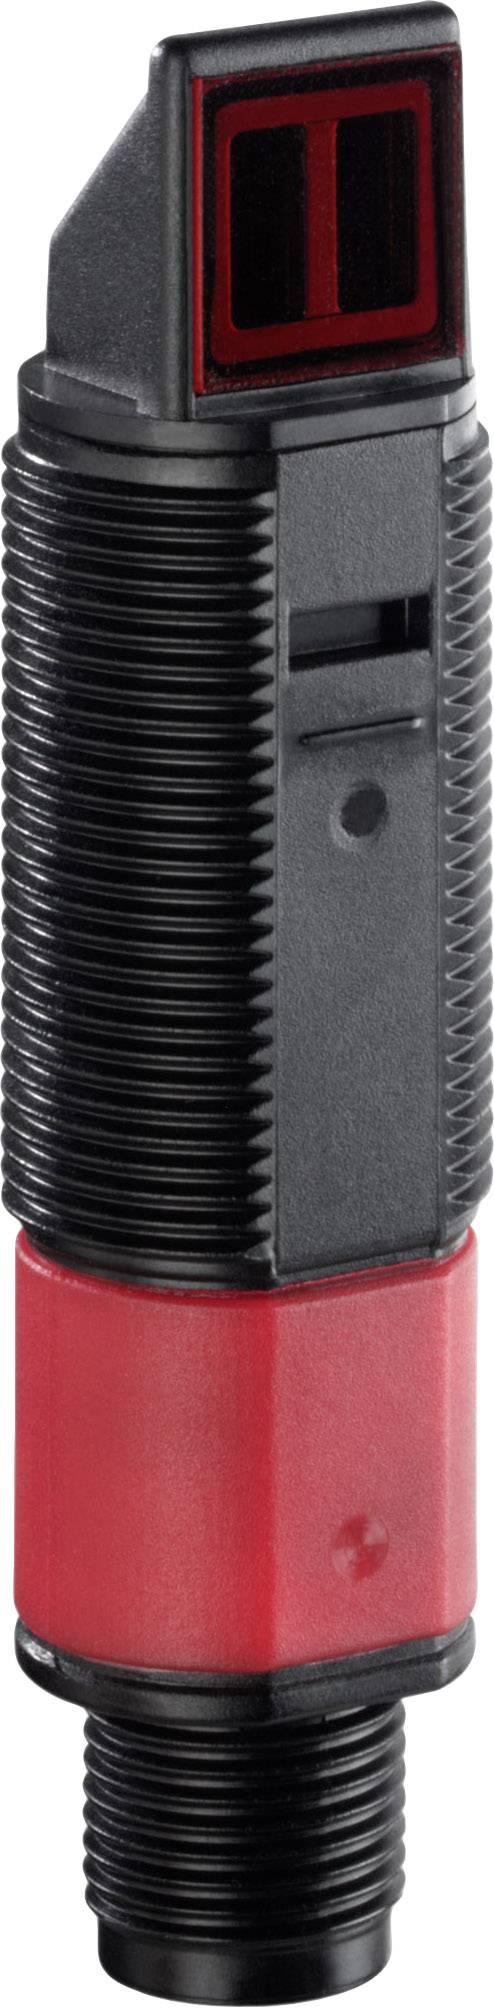 Reflexná svetelná závora Leuze Electronic PRK 318B.W/4P-M12